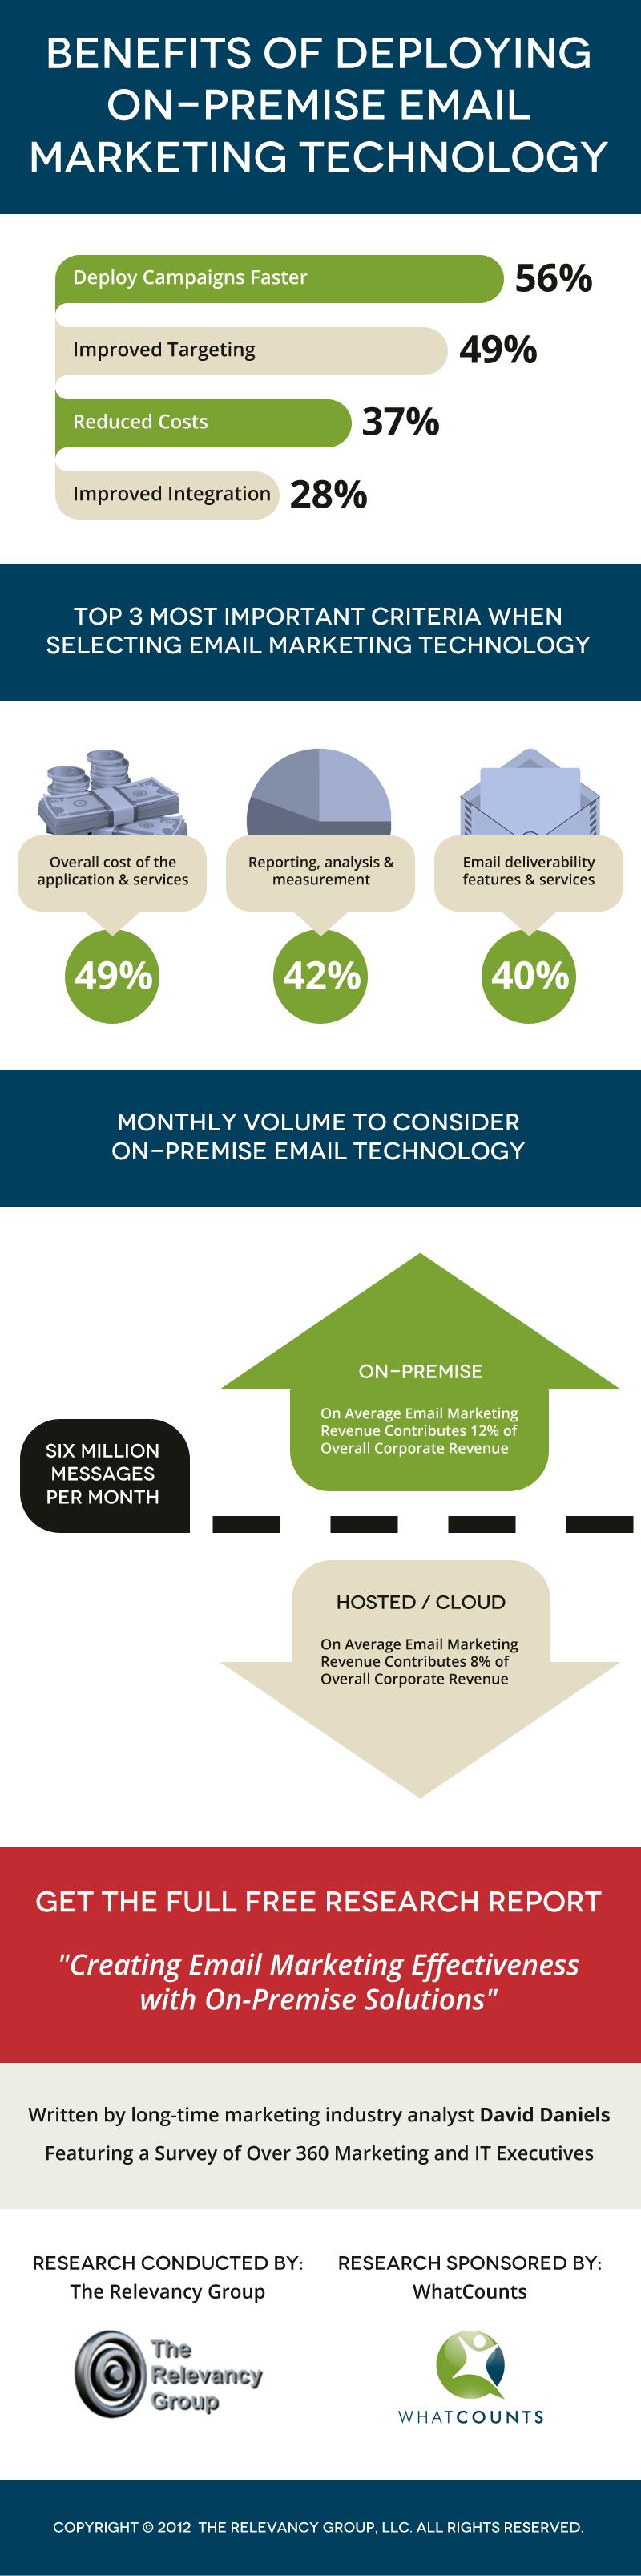 on-premise email marketing technology benefits